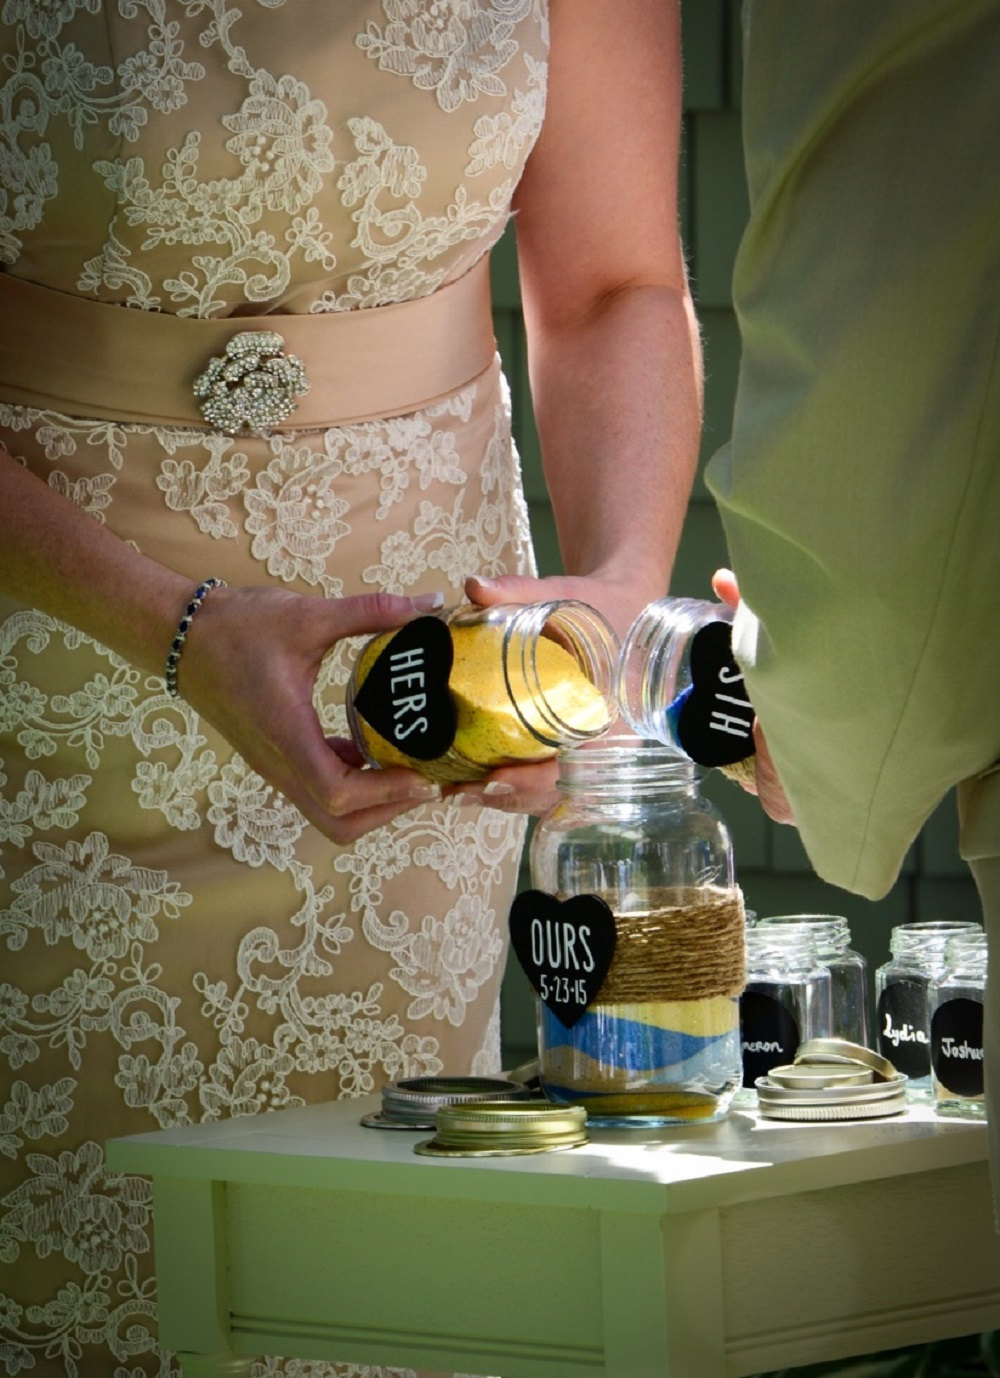 mason jar sand ceremony jars | mason jar ideas weddings